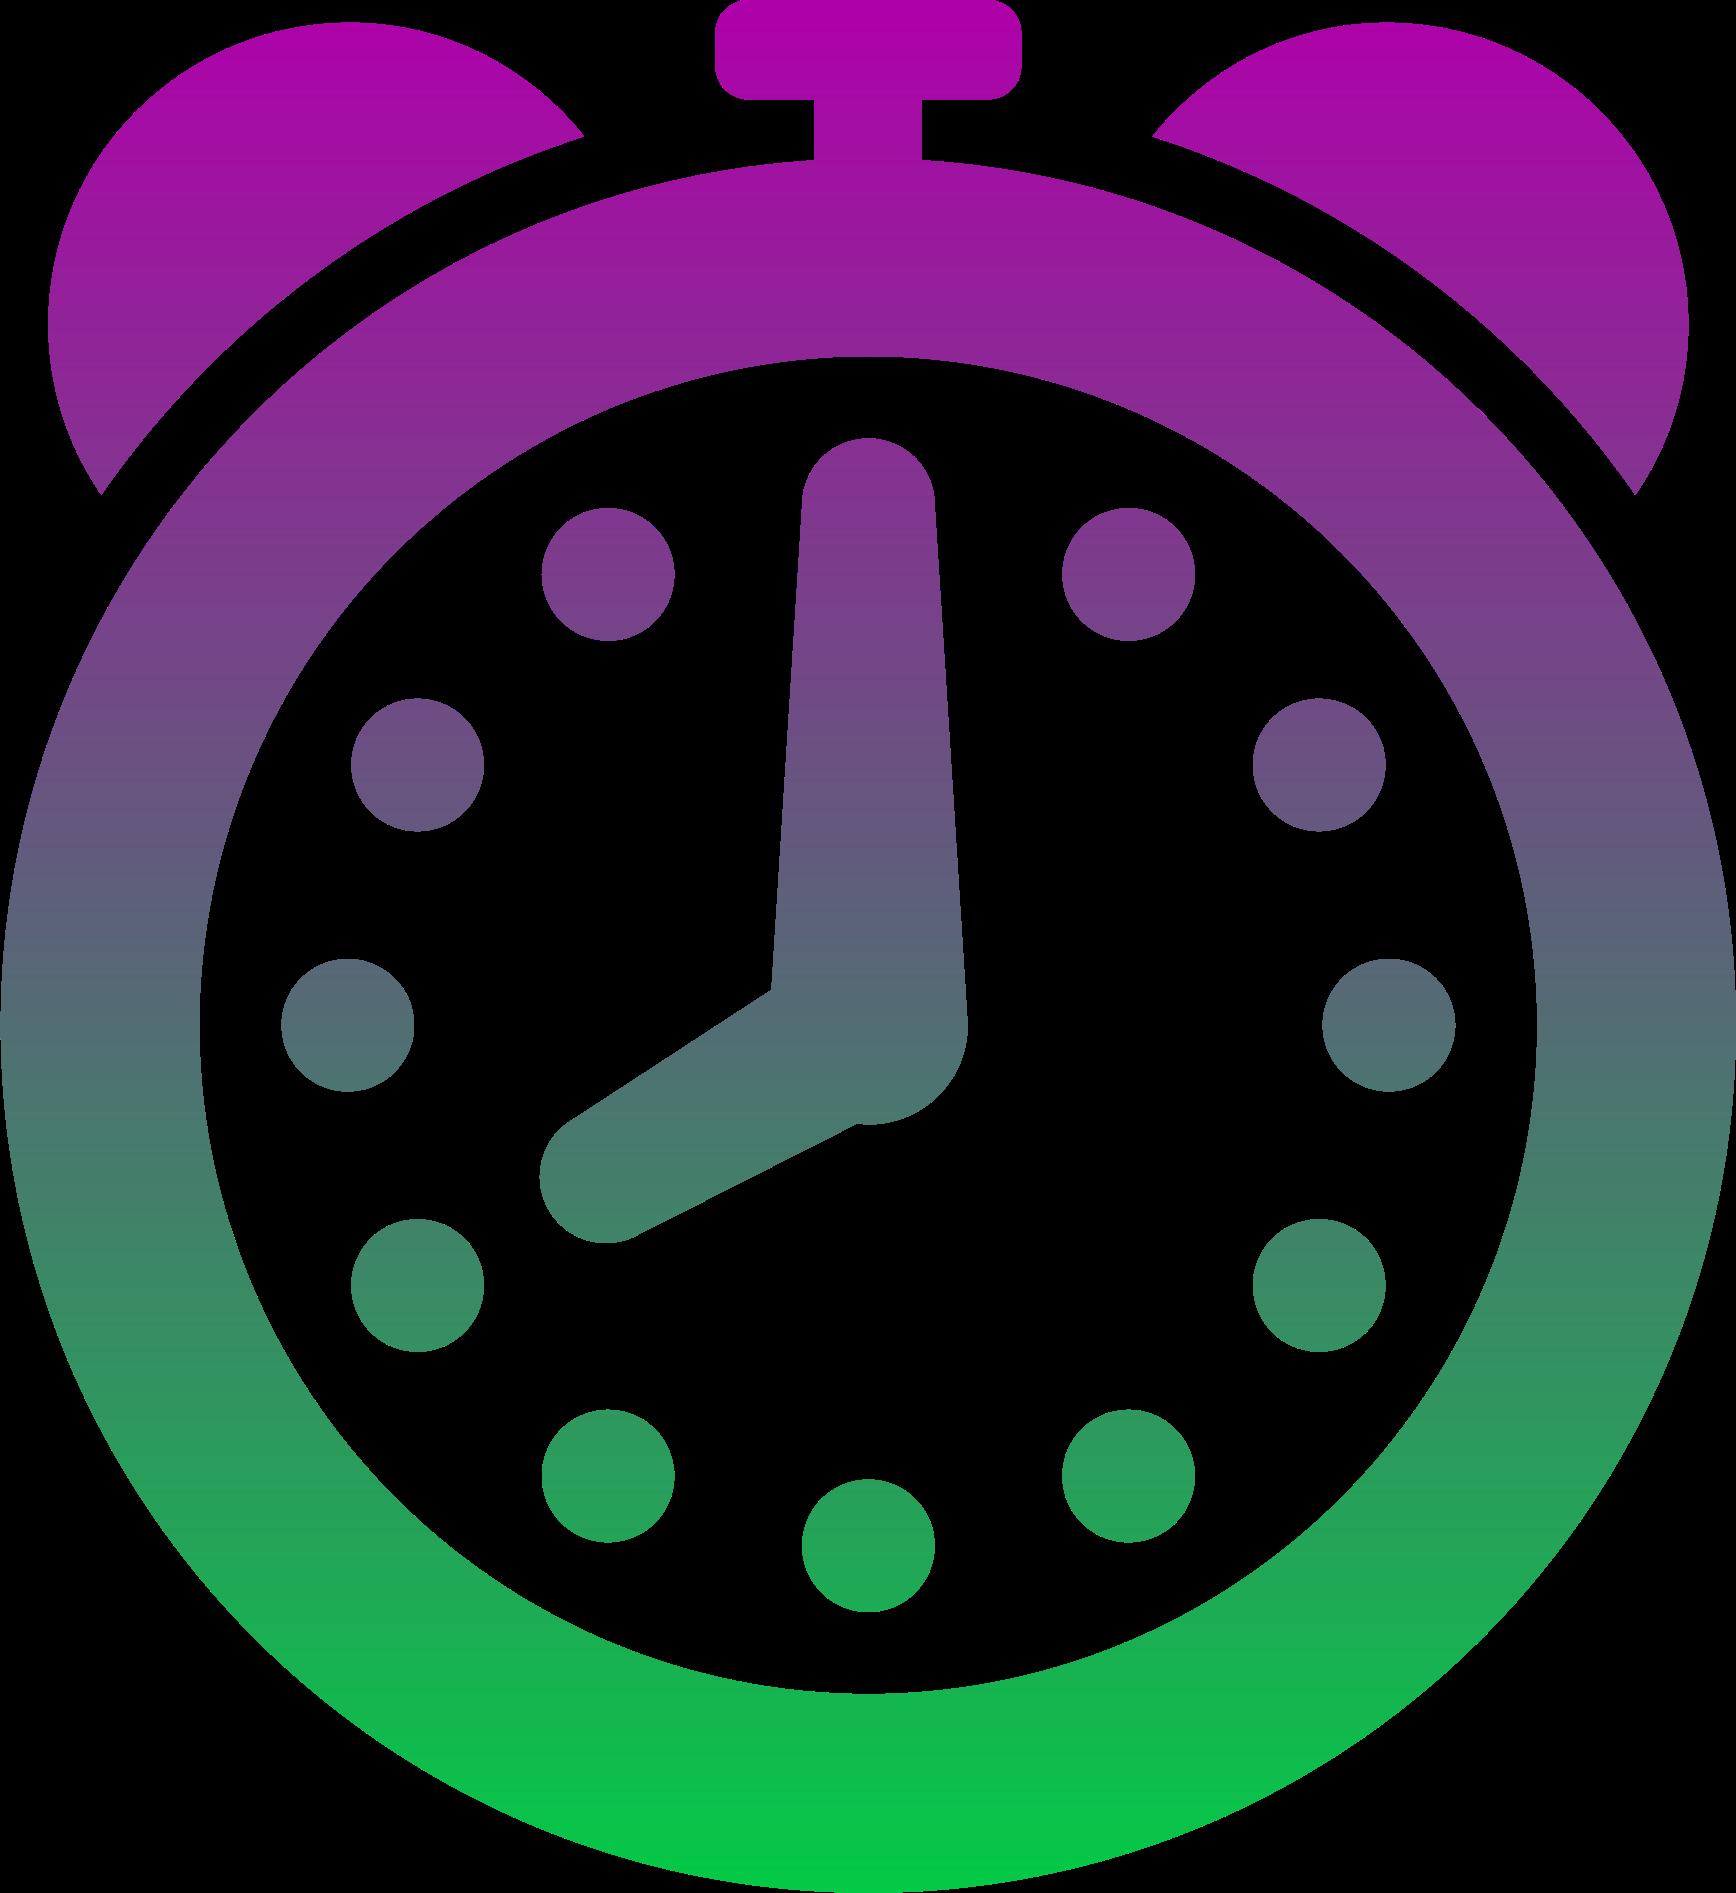 Clock clipart purple. Coloured big image png